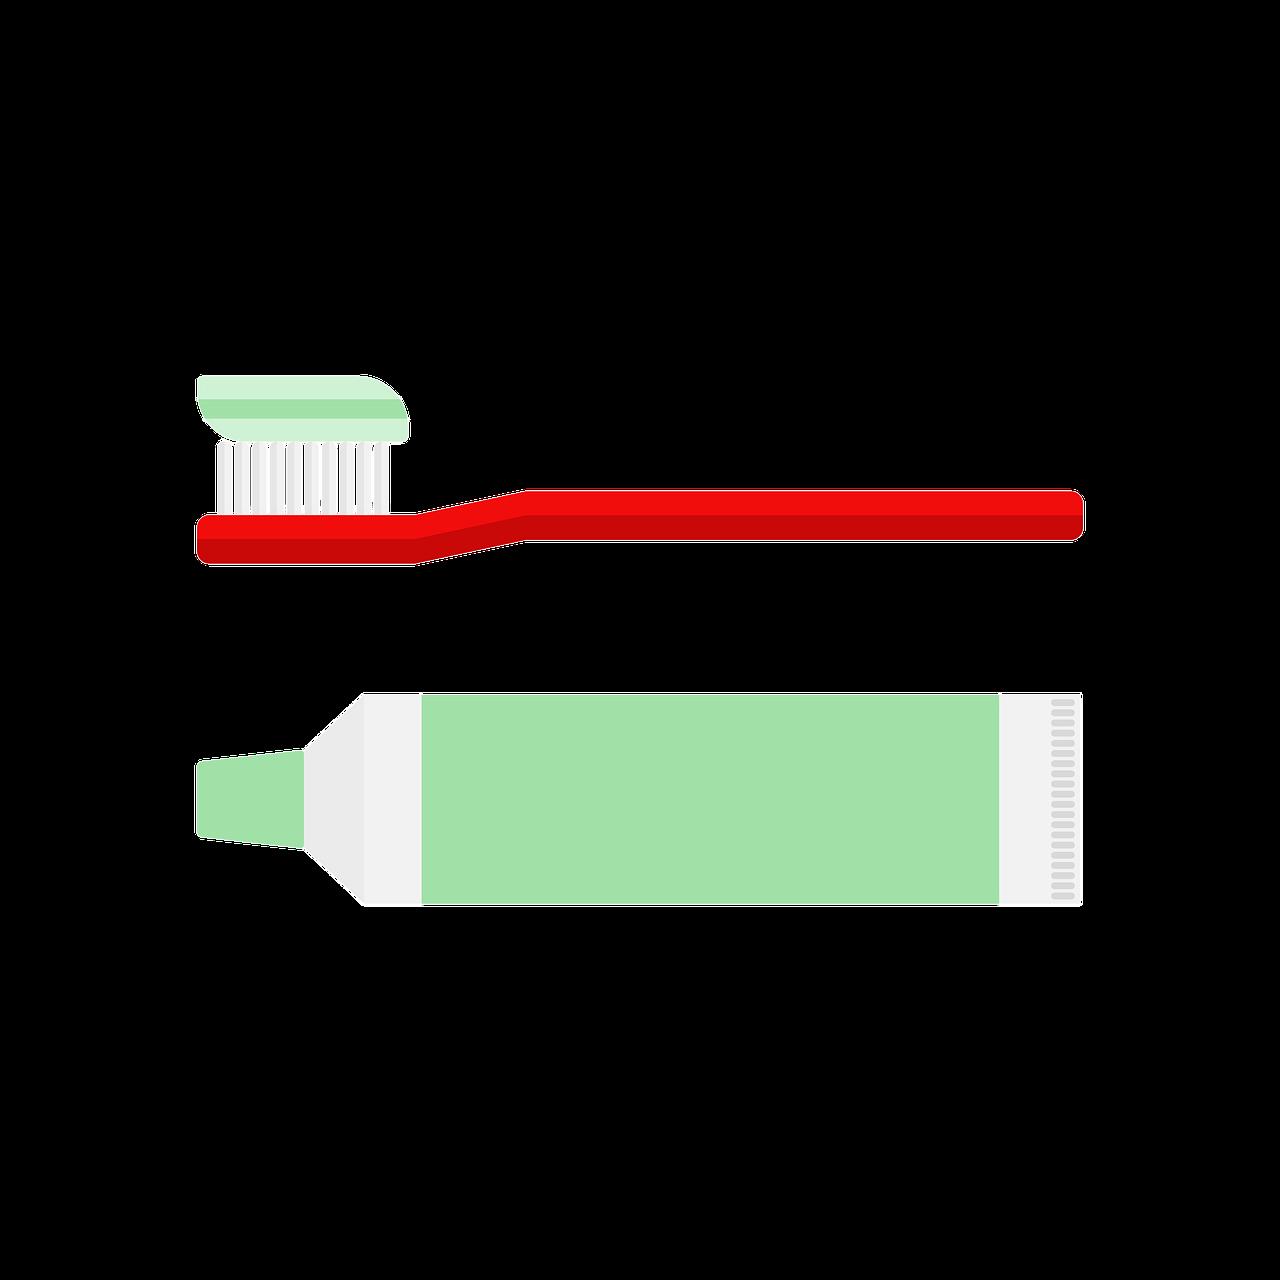 Tand & Meer narcose tandarts kosten